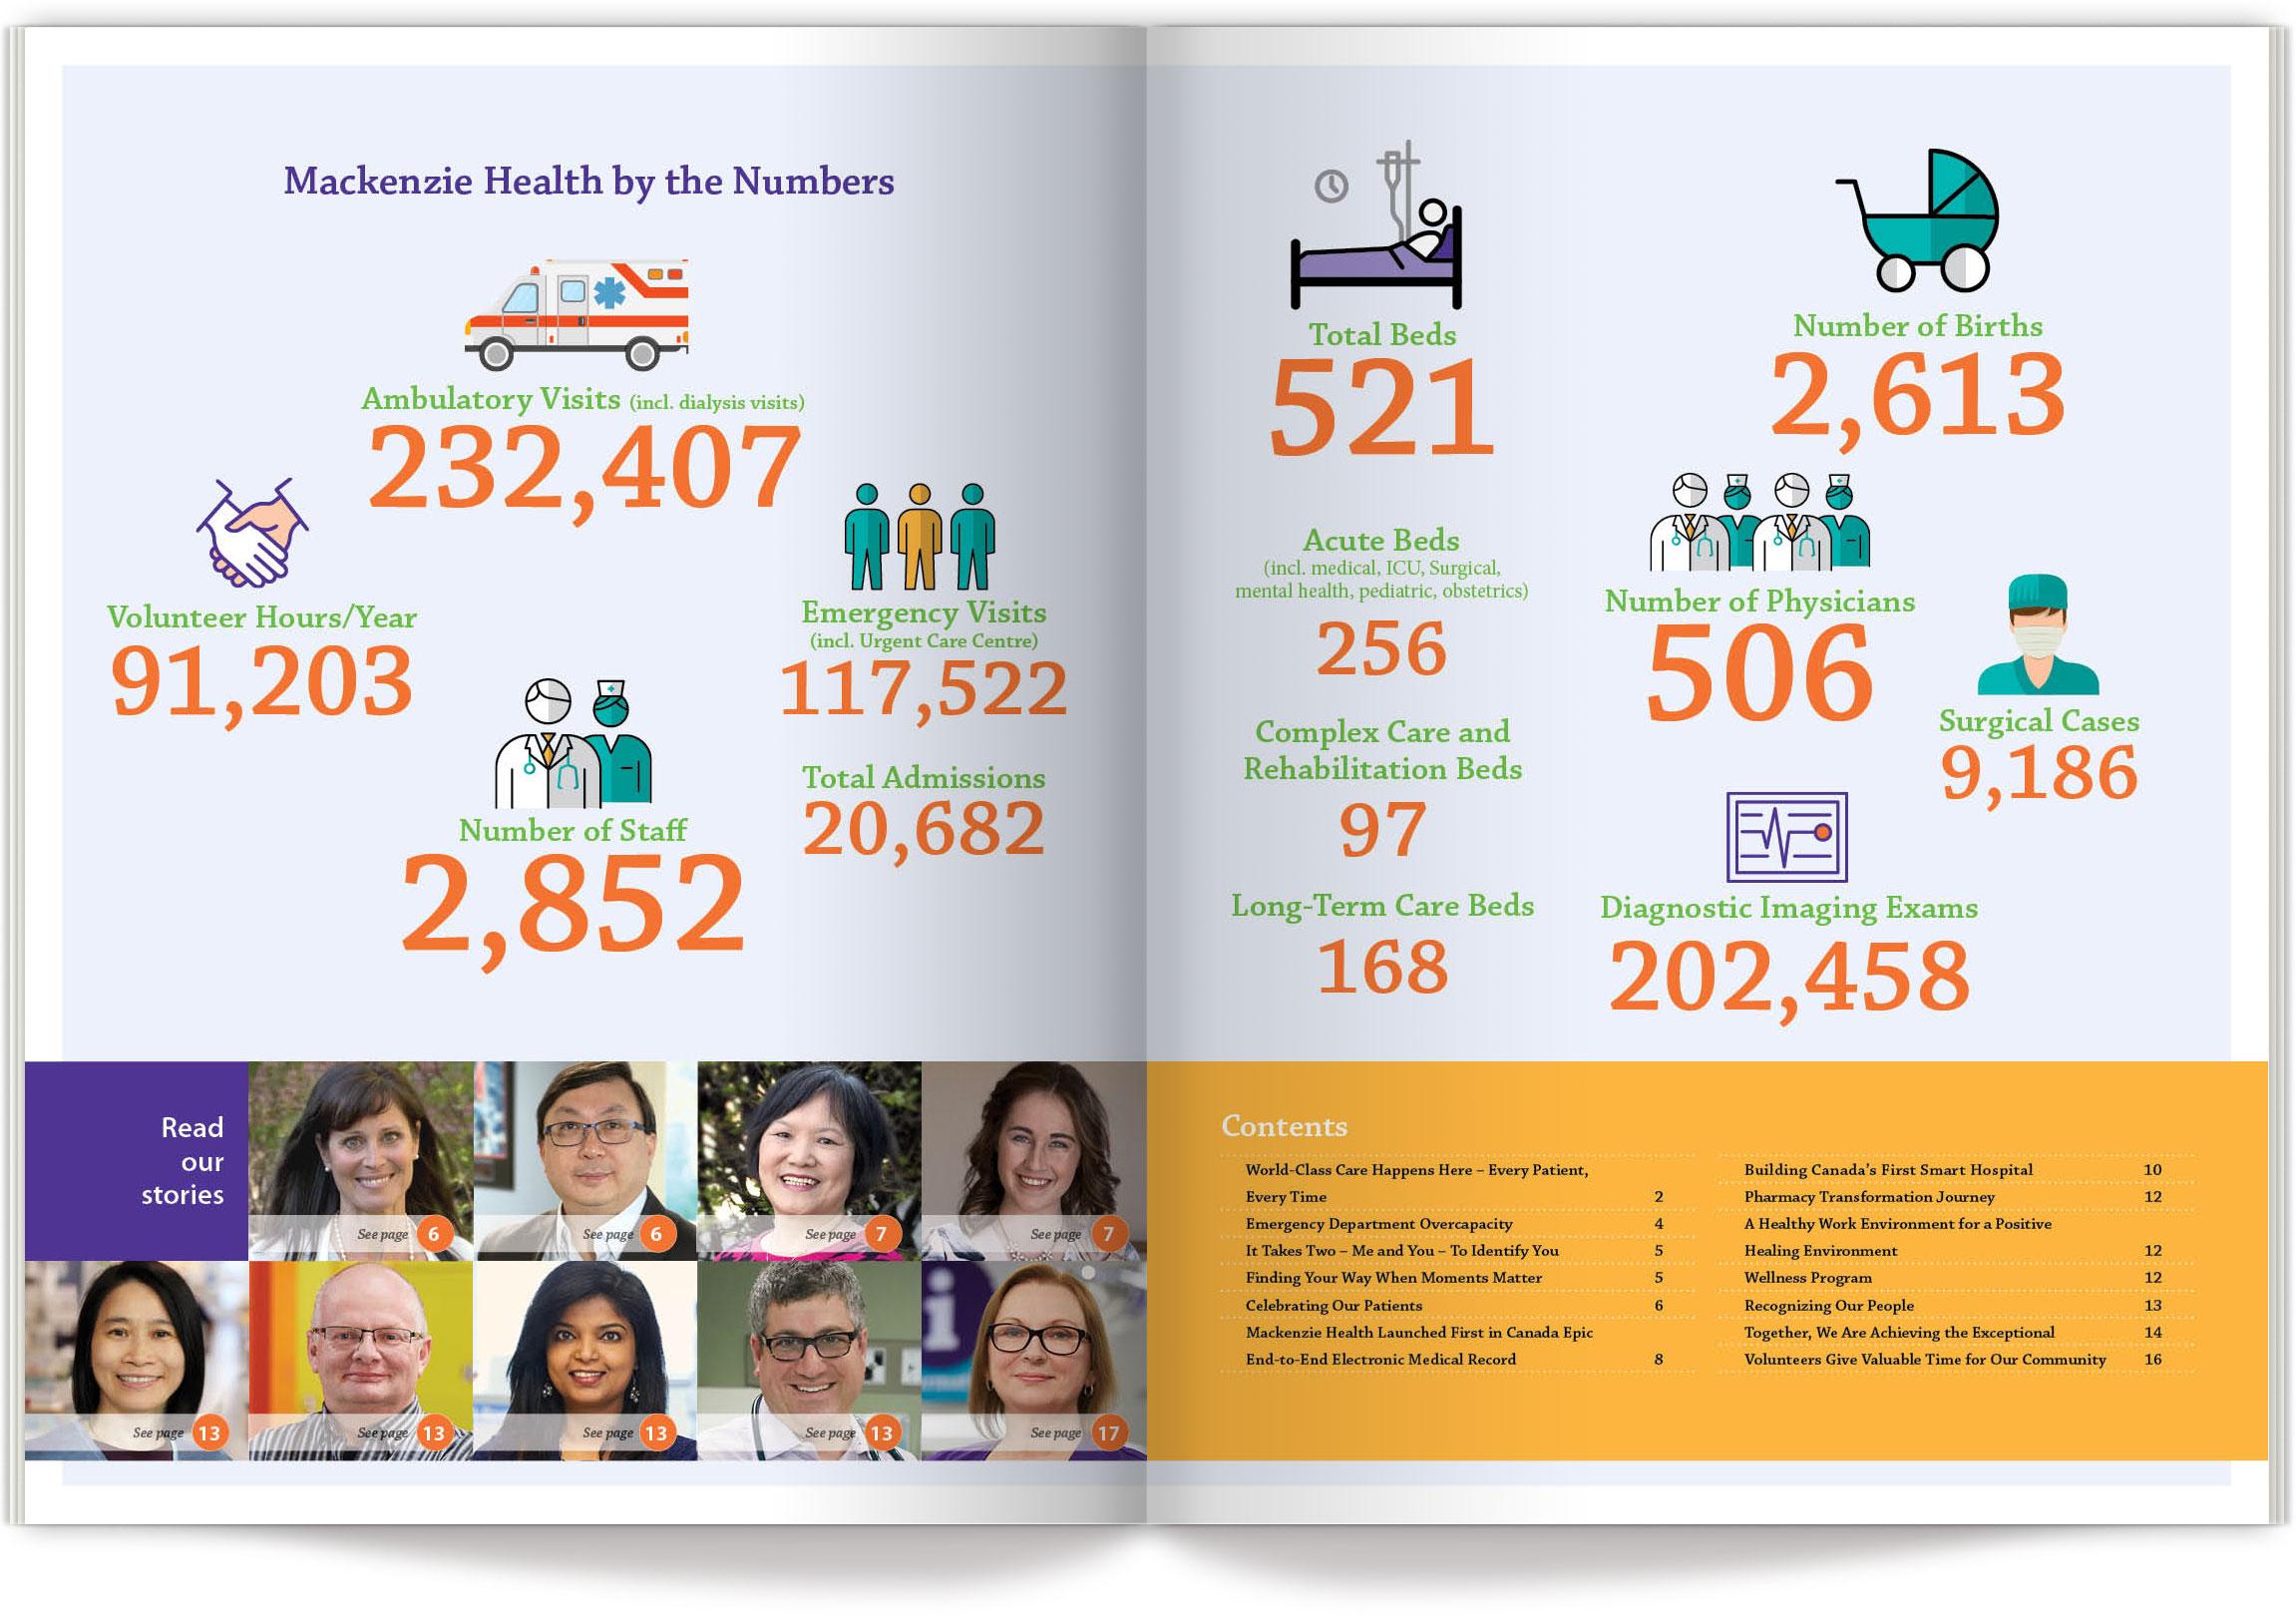 Mackenzie Health by the numbers